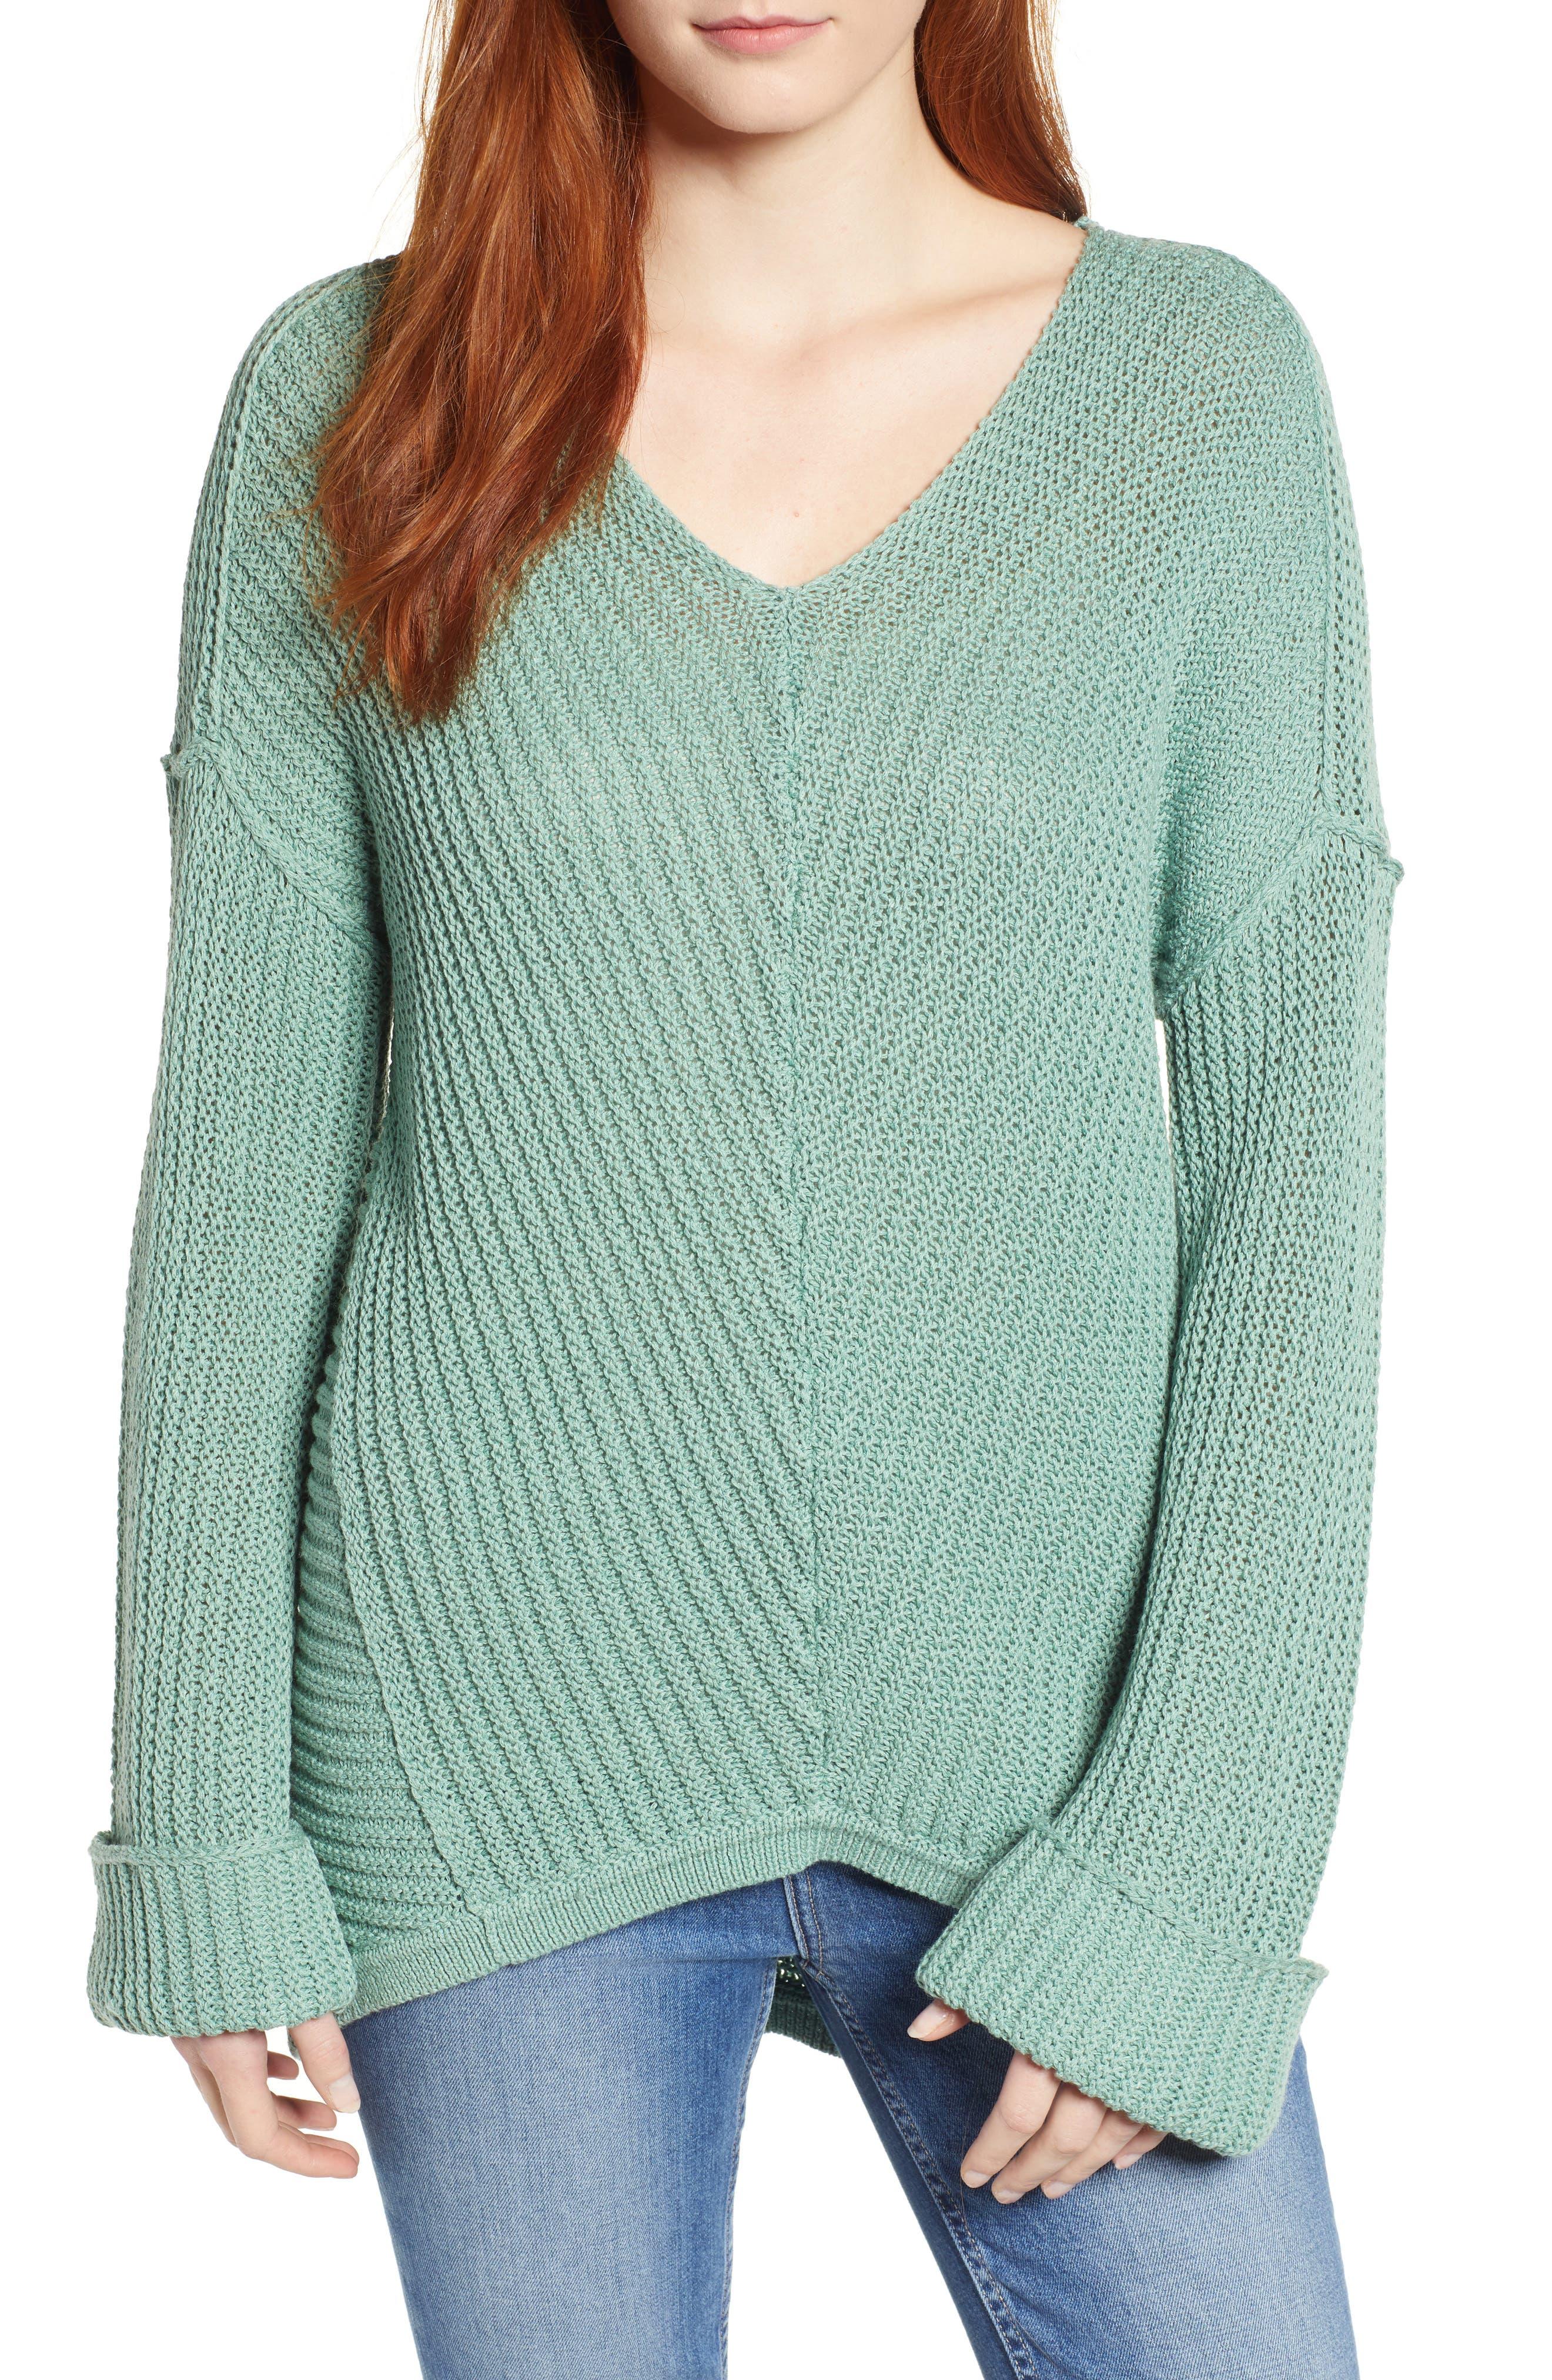 Cuffed Sleeve Sweater, Main, color, 330